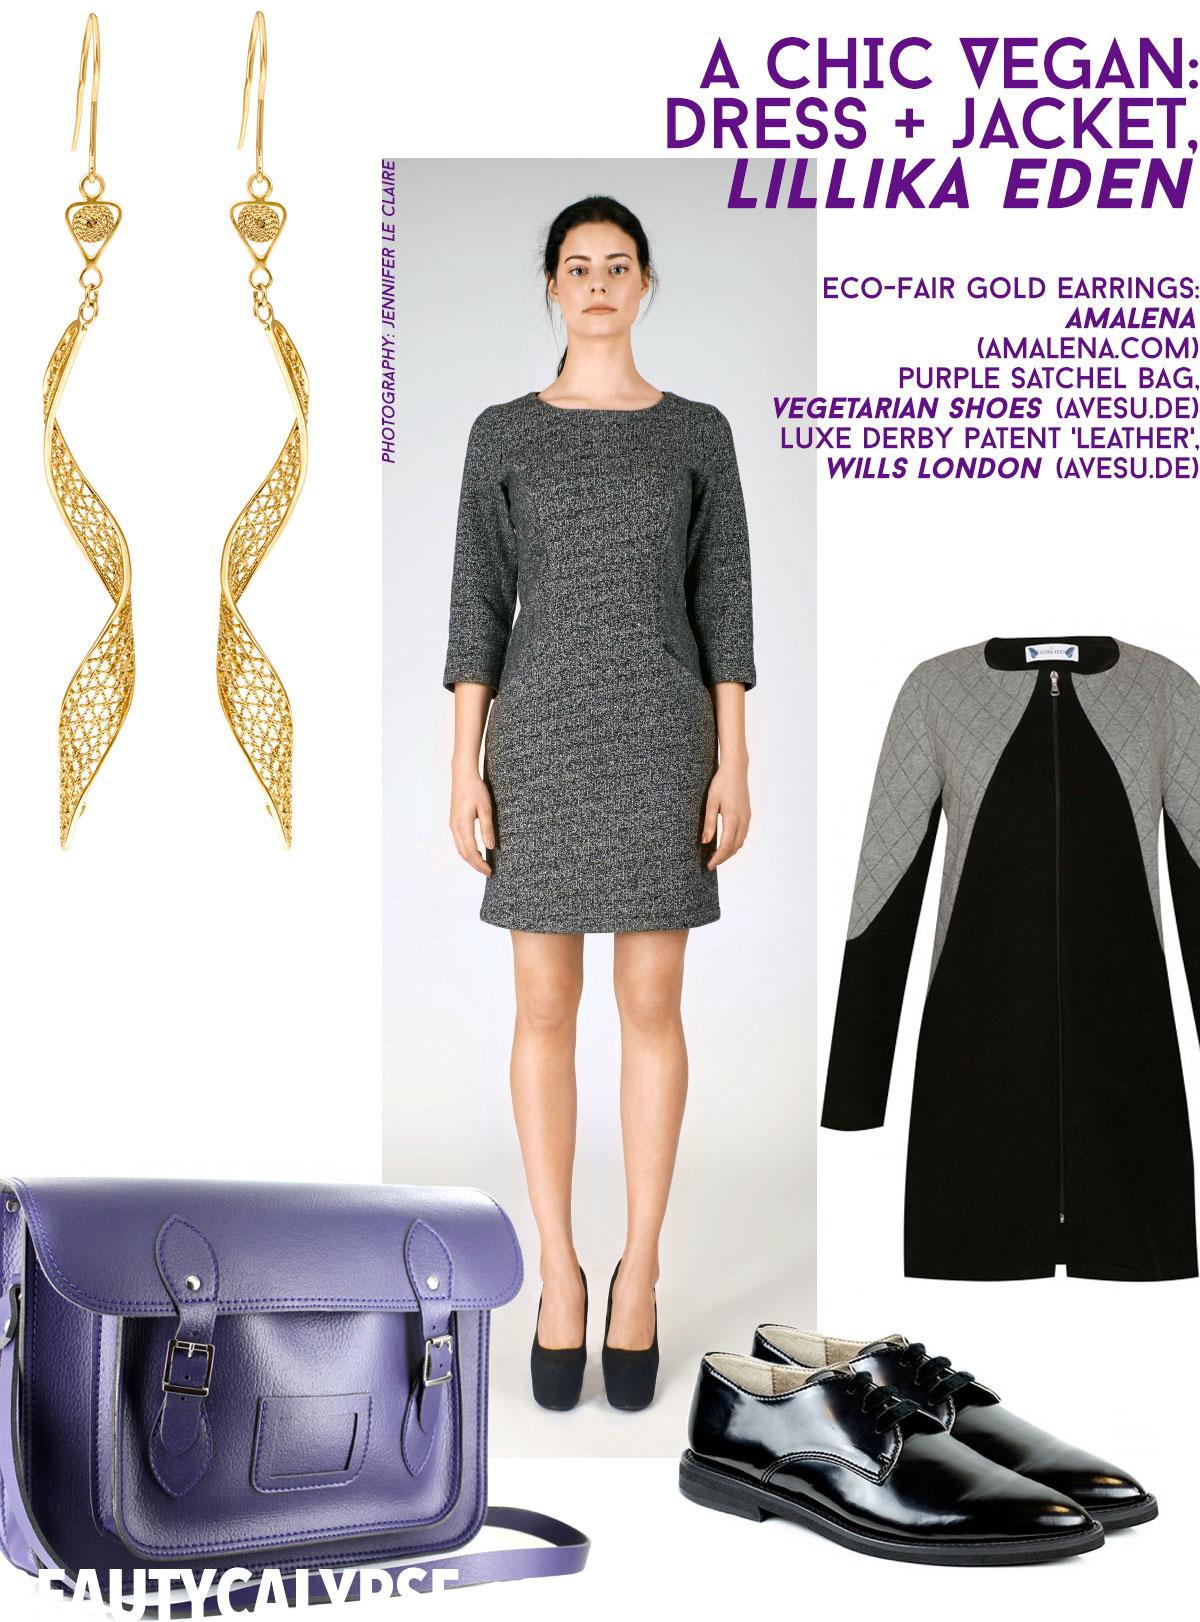 eco-fair-vegan-fashion-look-with-lillika-eden-business